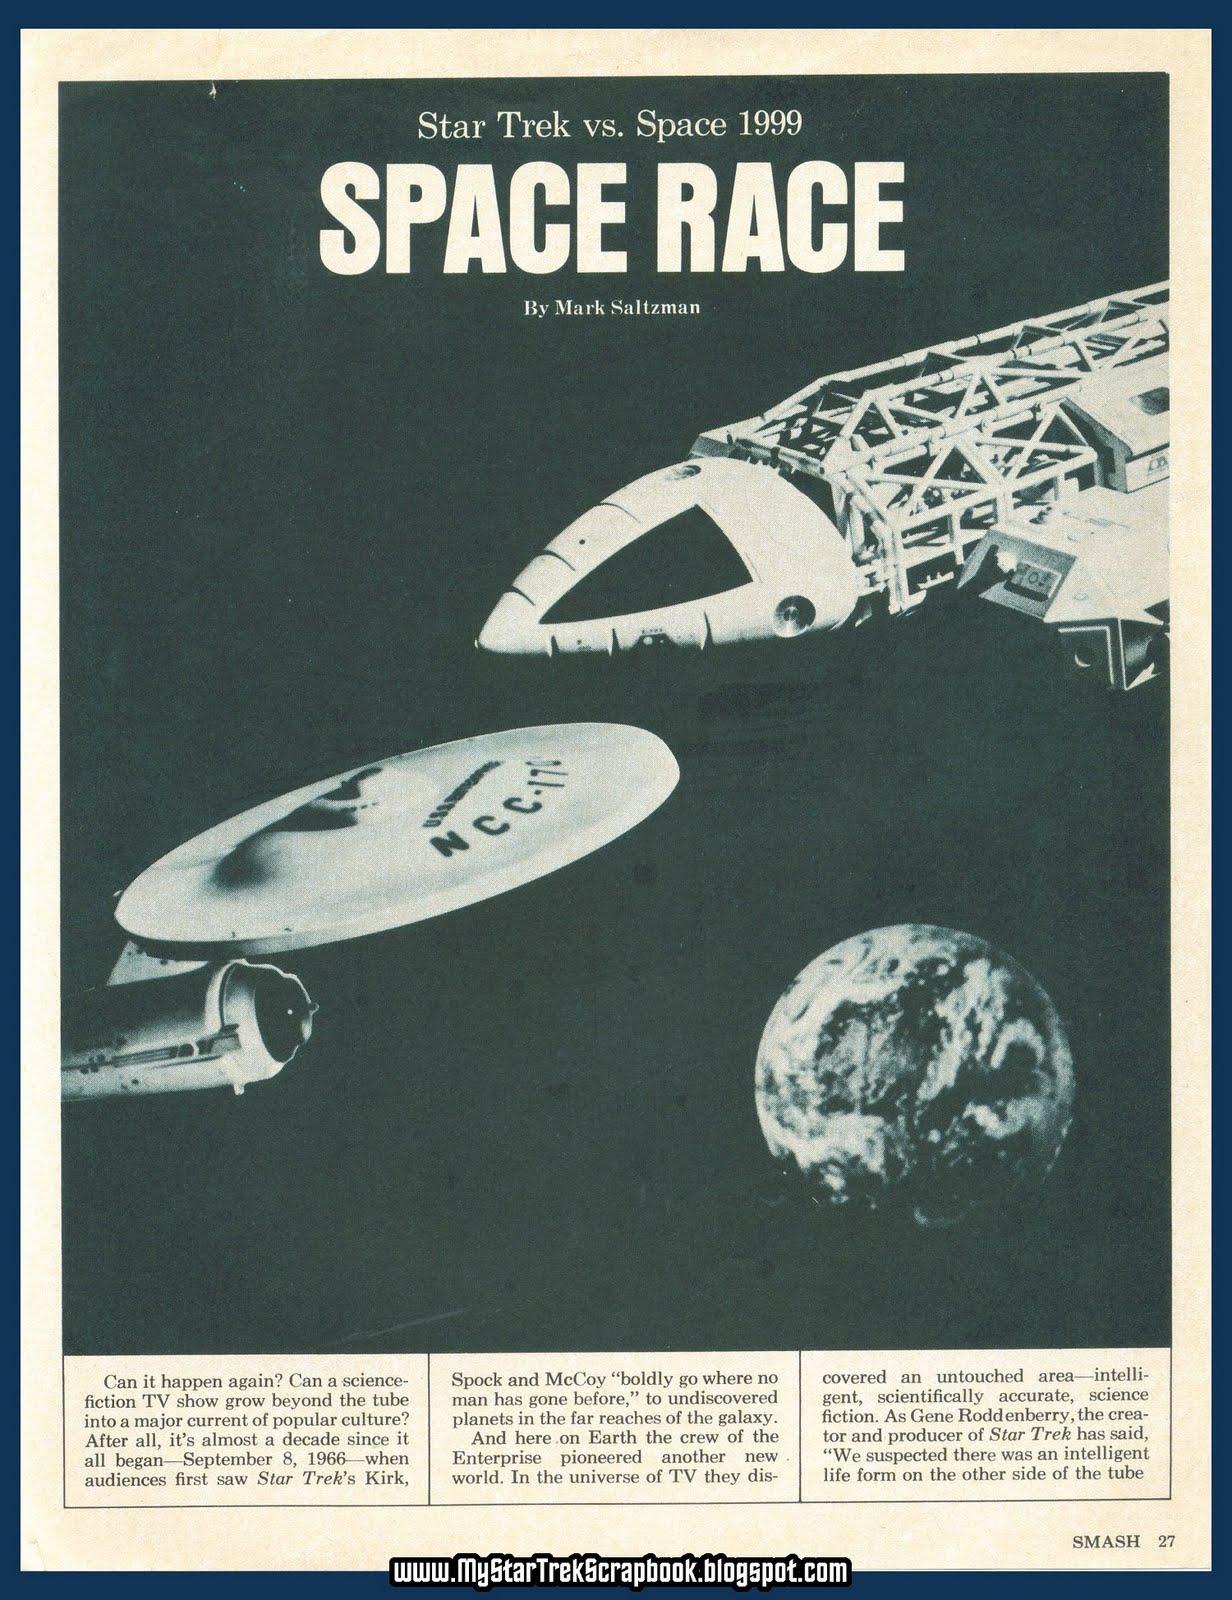 My Star Trek Scrapbook: Space Race: Trek vs. Space:1999